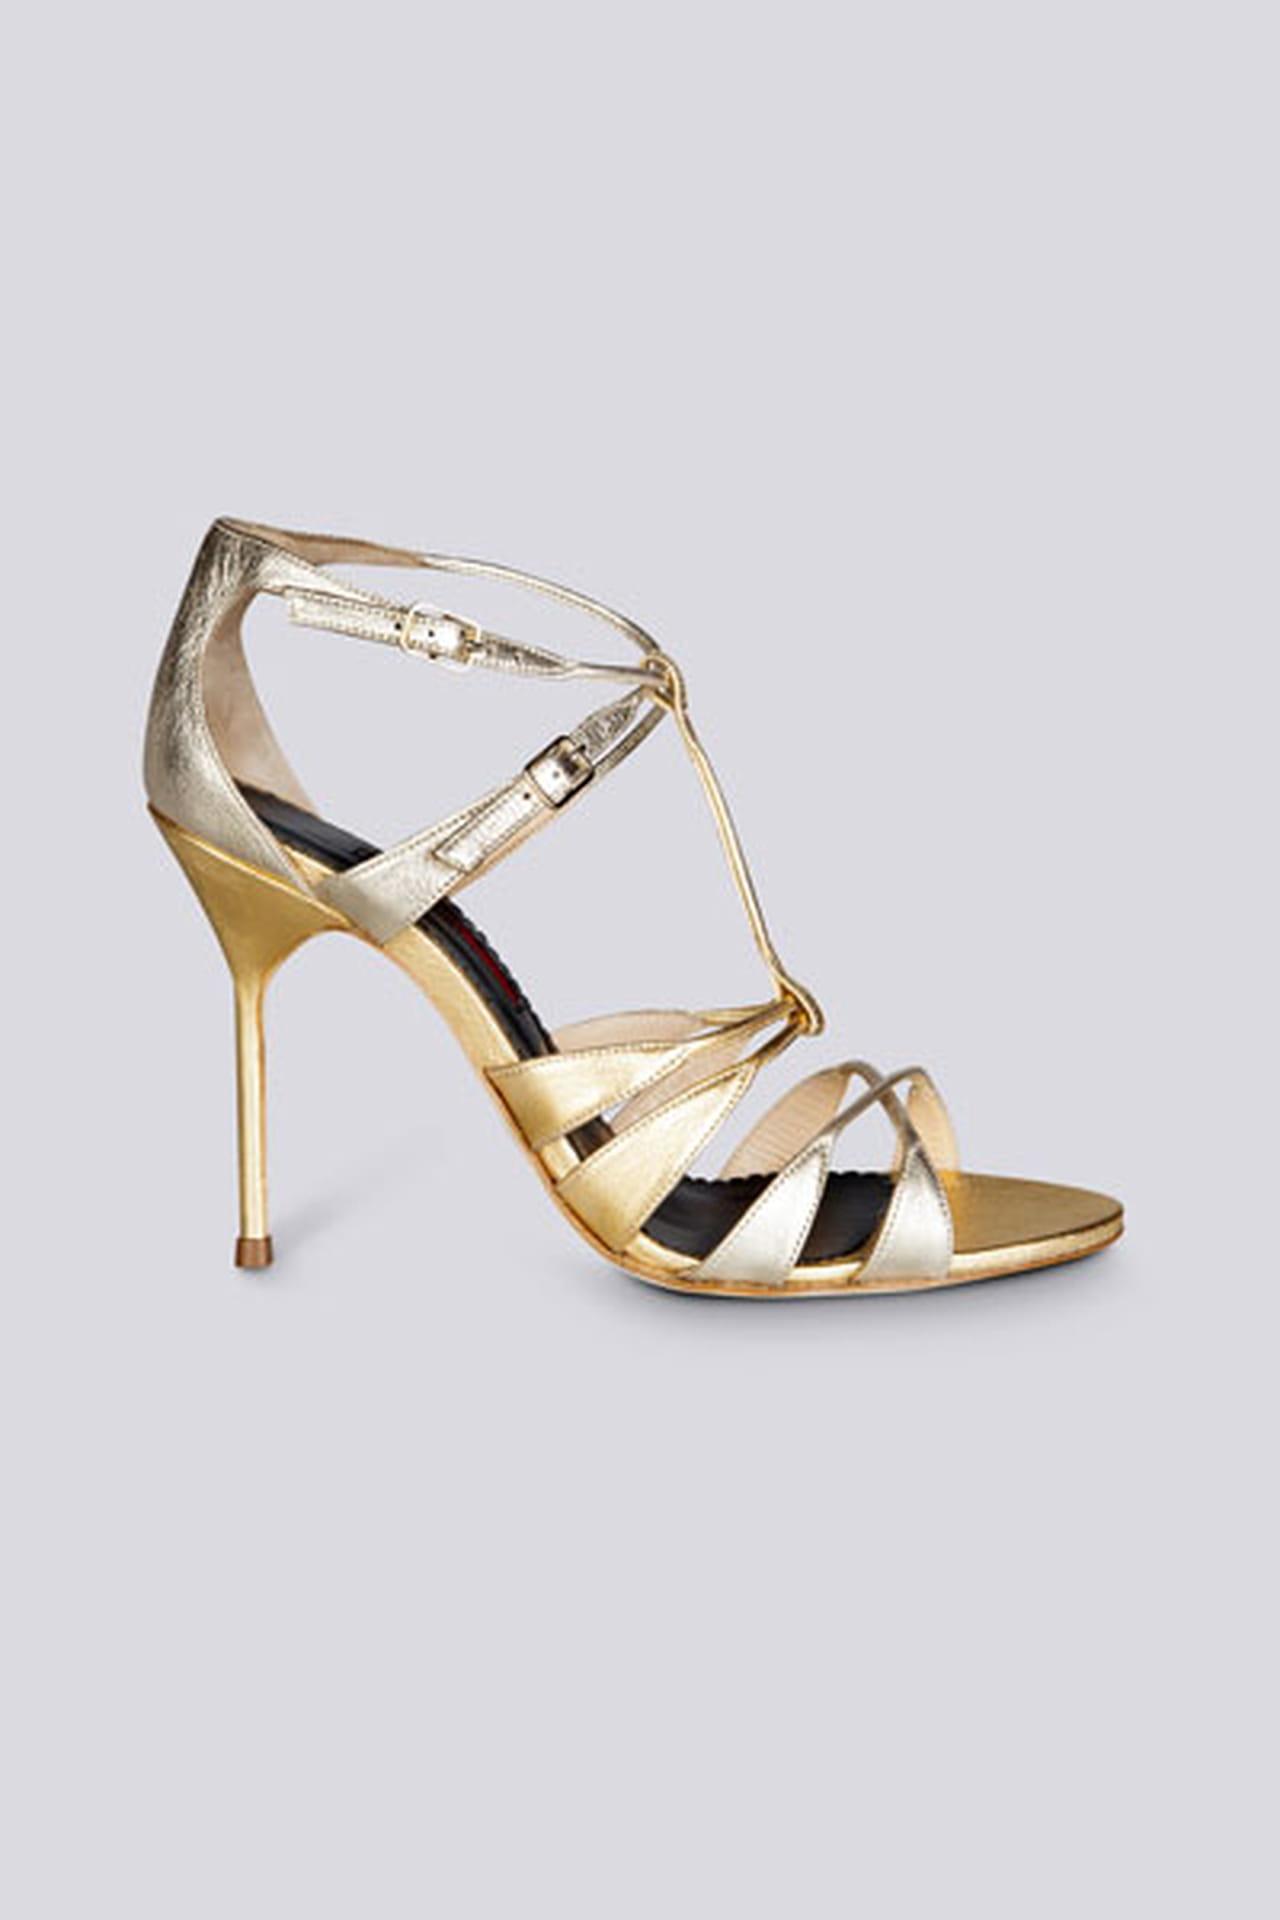 abe6dcfe8 حذاء أنيق من مجموعة كارولينا هيريرا Carolina Herrera لربيع وصيف 2014.